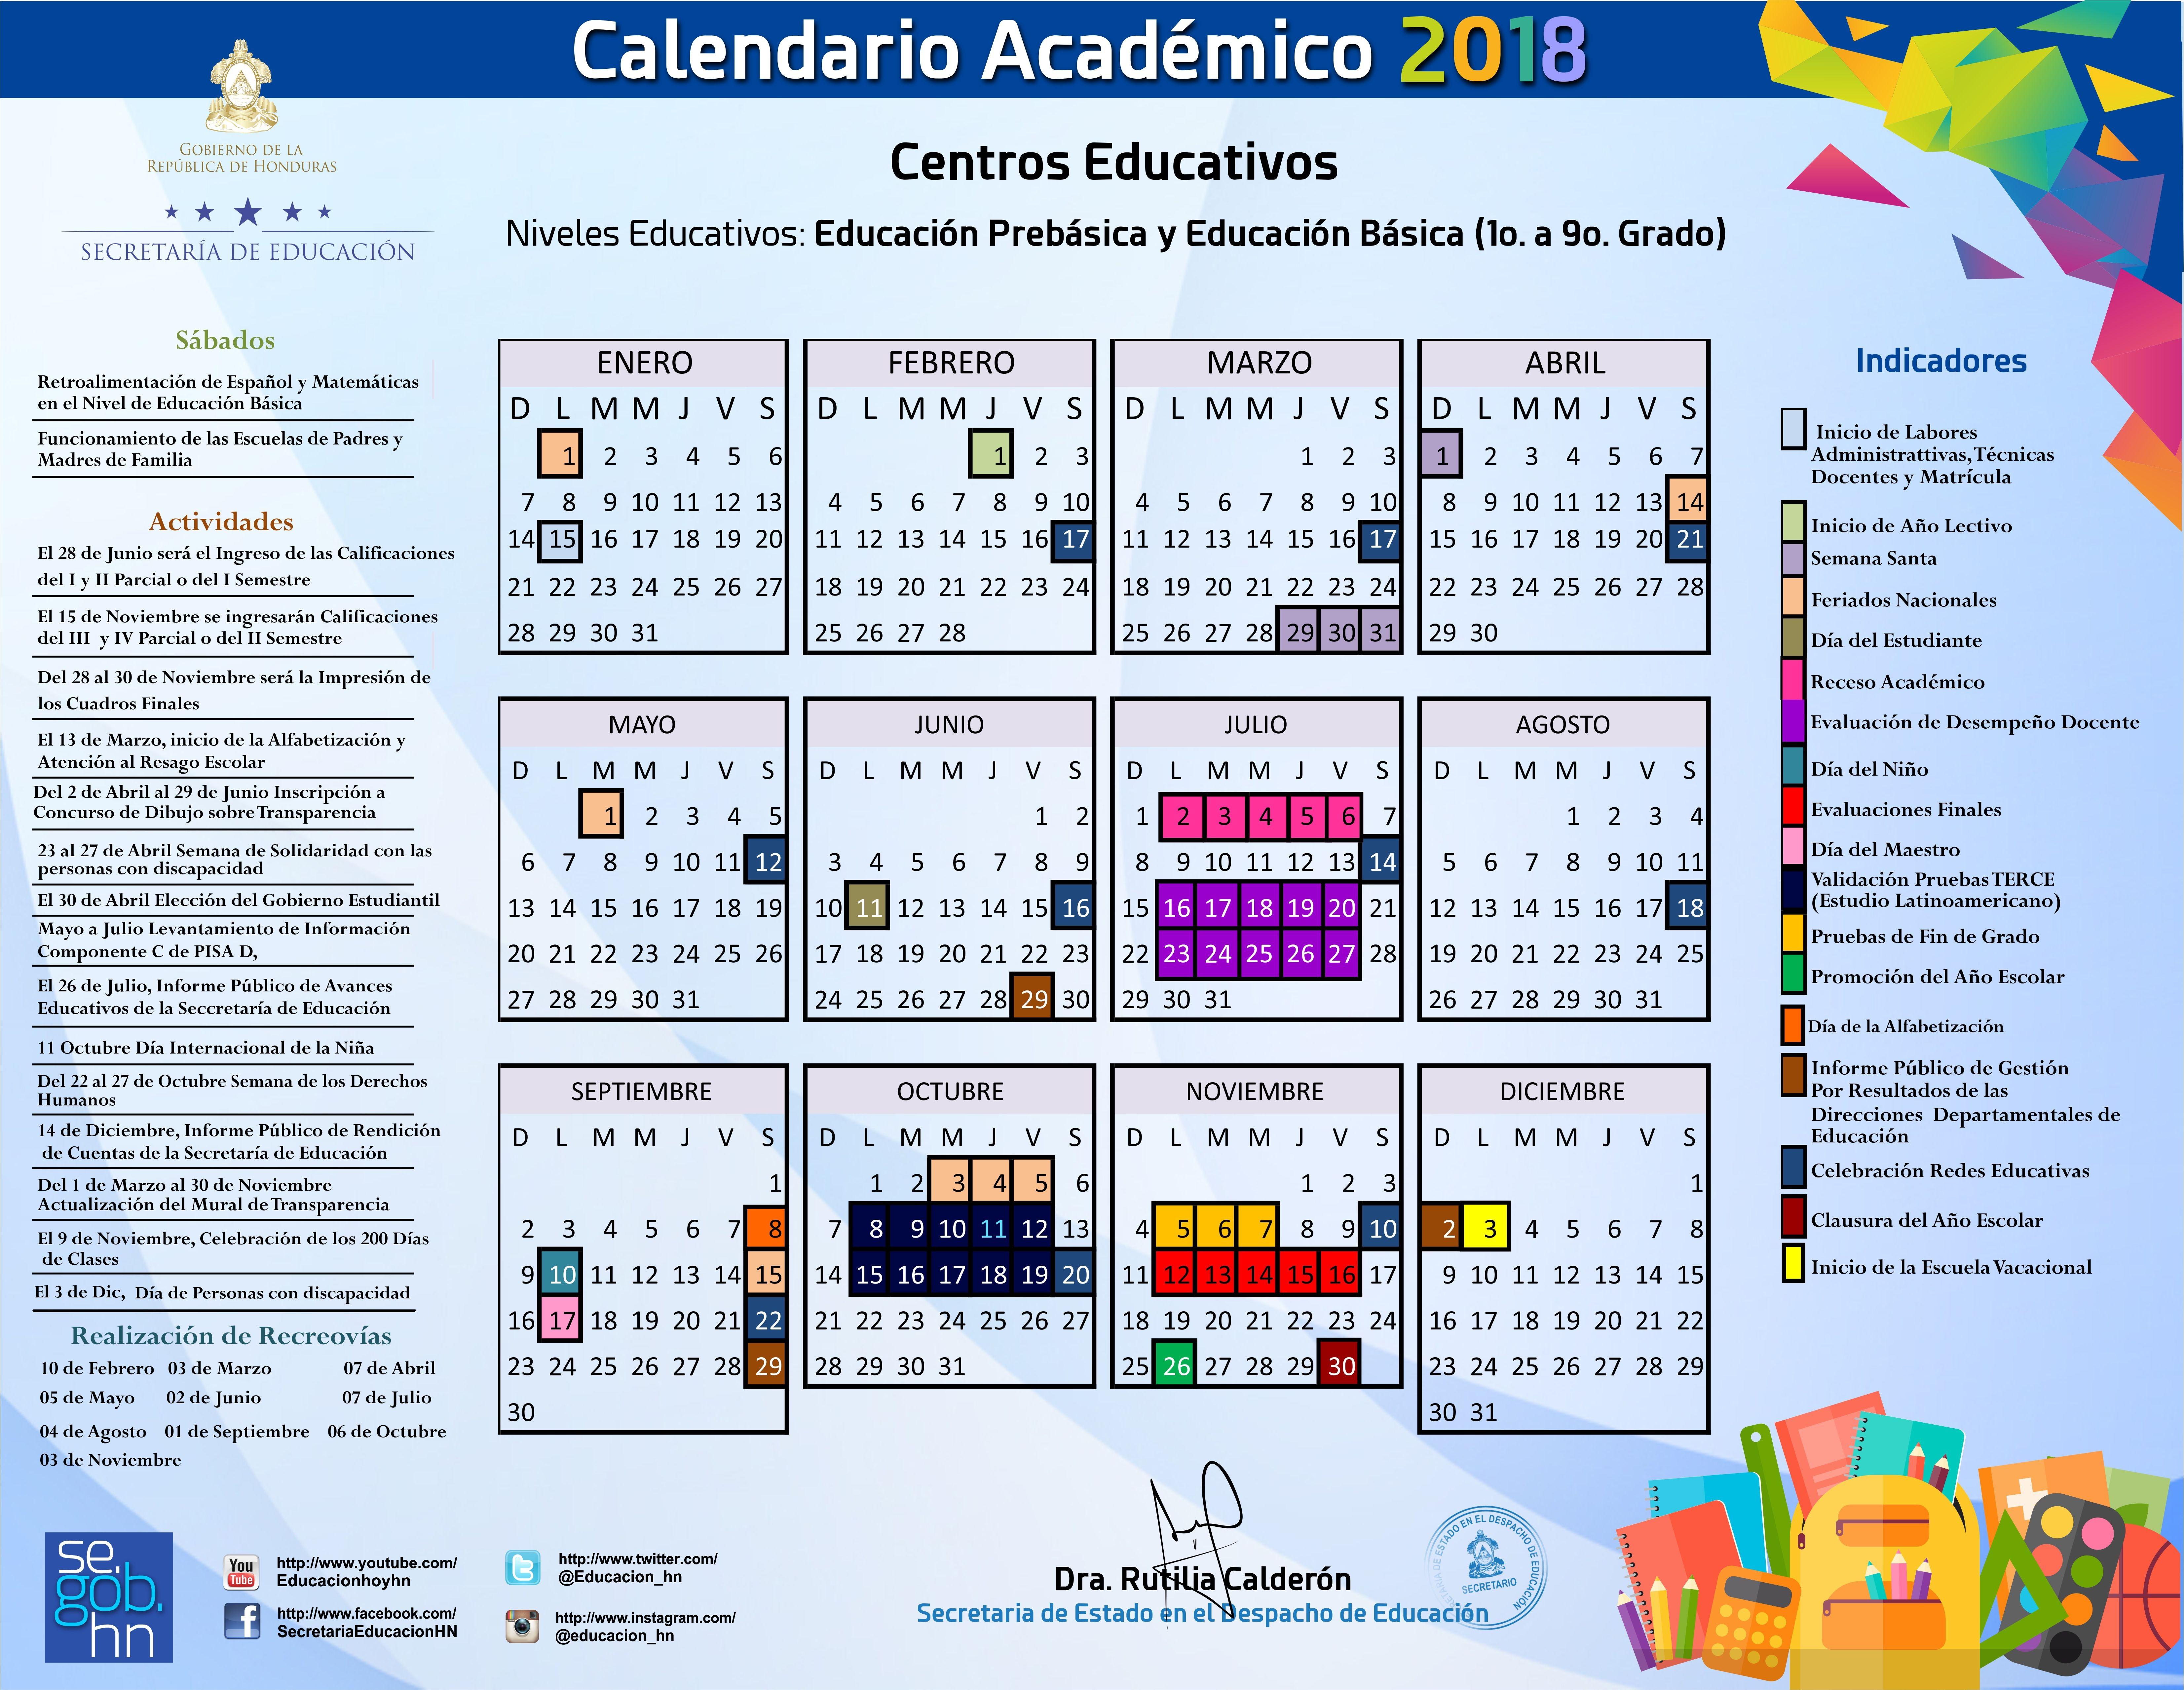 Calendario Escolar 2019 Imprimir Más Populares Se Of Calendario Escolar 2019 Imprimir Actual Calendario 8 Agosto ☼ Calendario Pinterest